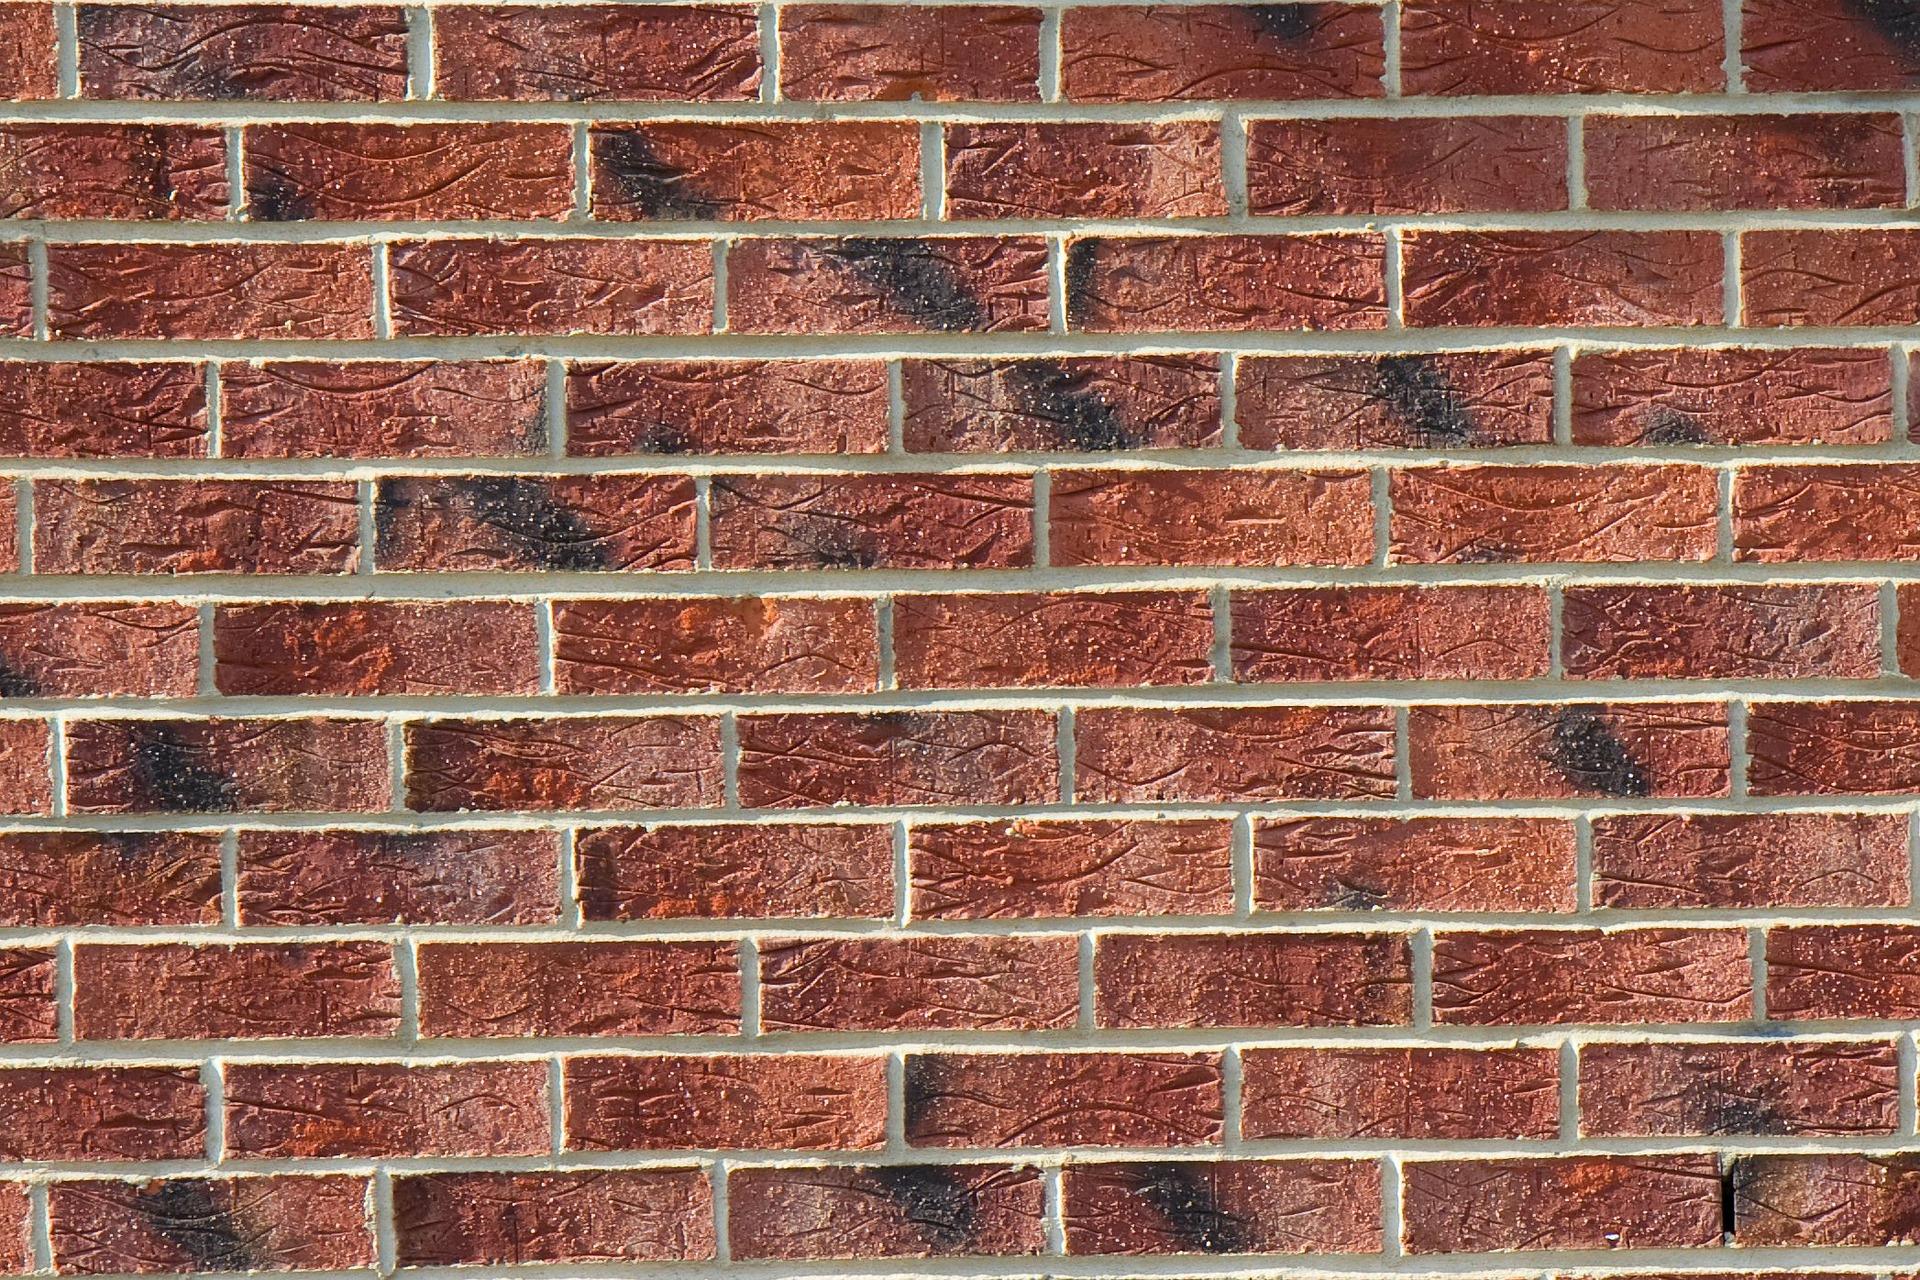 brick-1980_1920